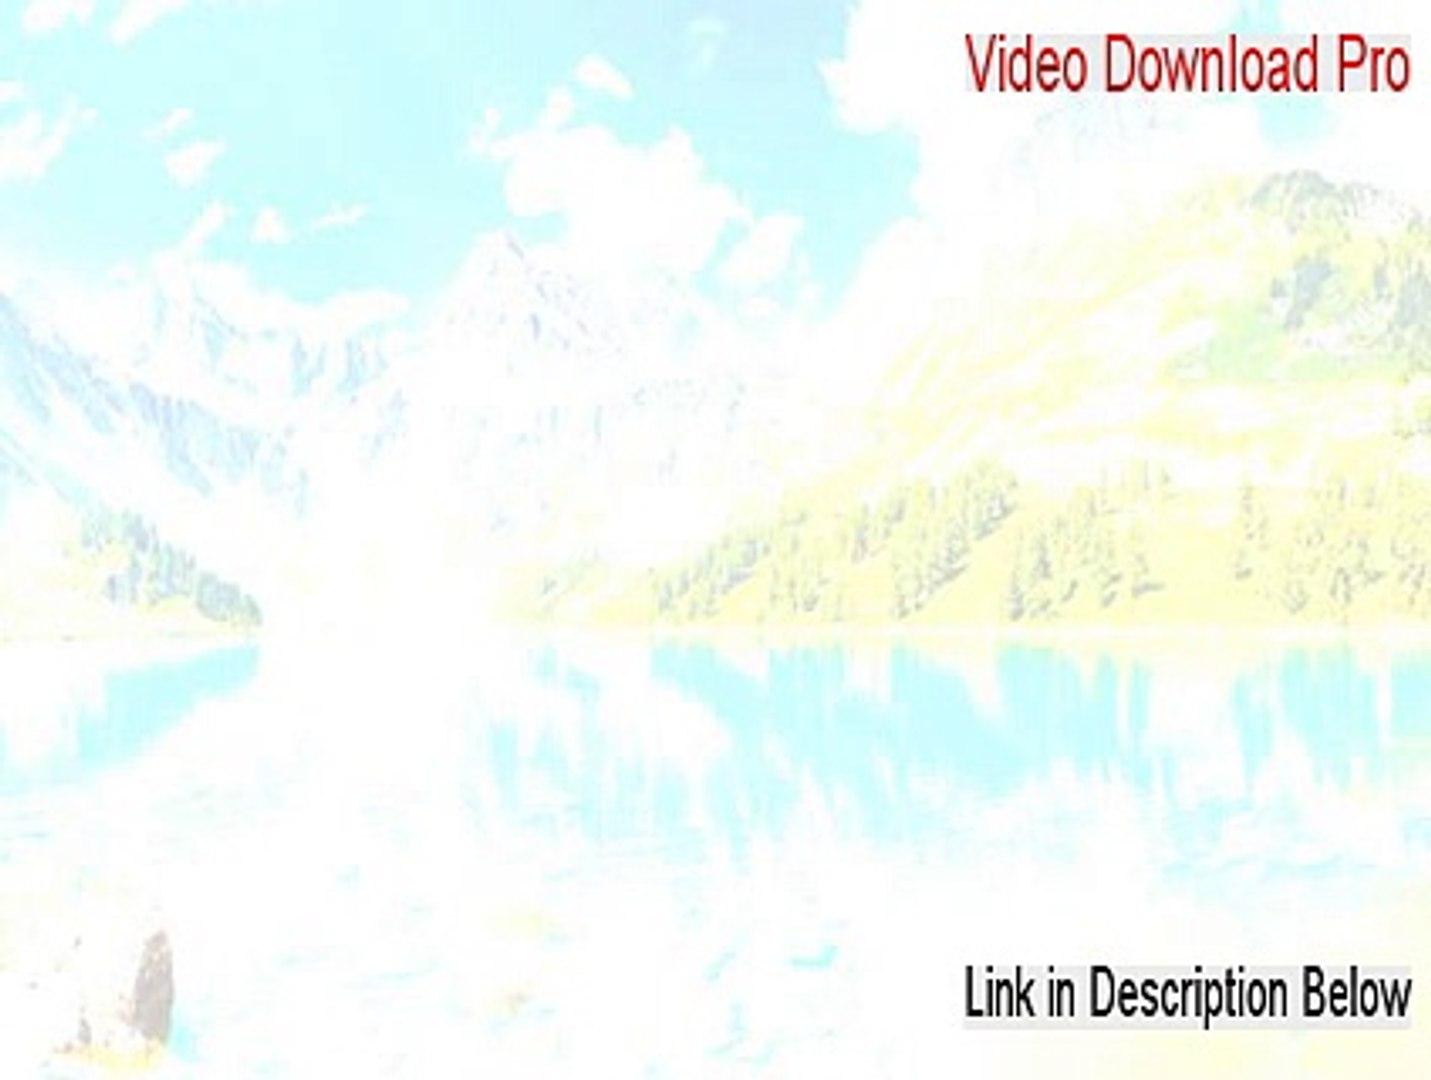 Video Download Pro Key Gen [Instant Download]